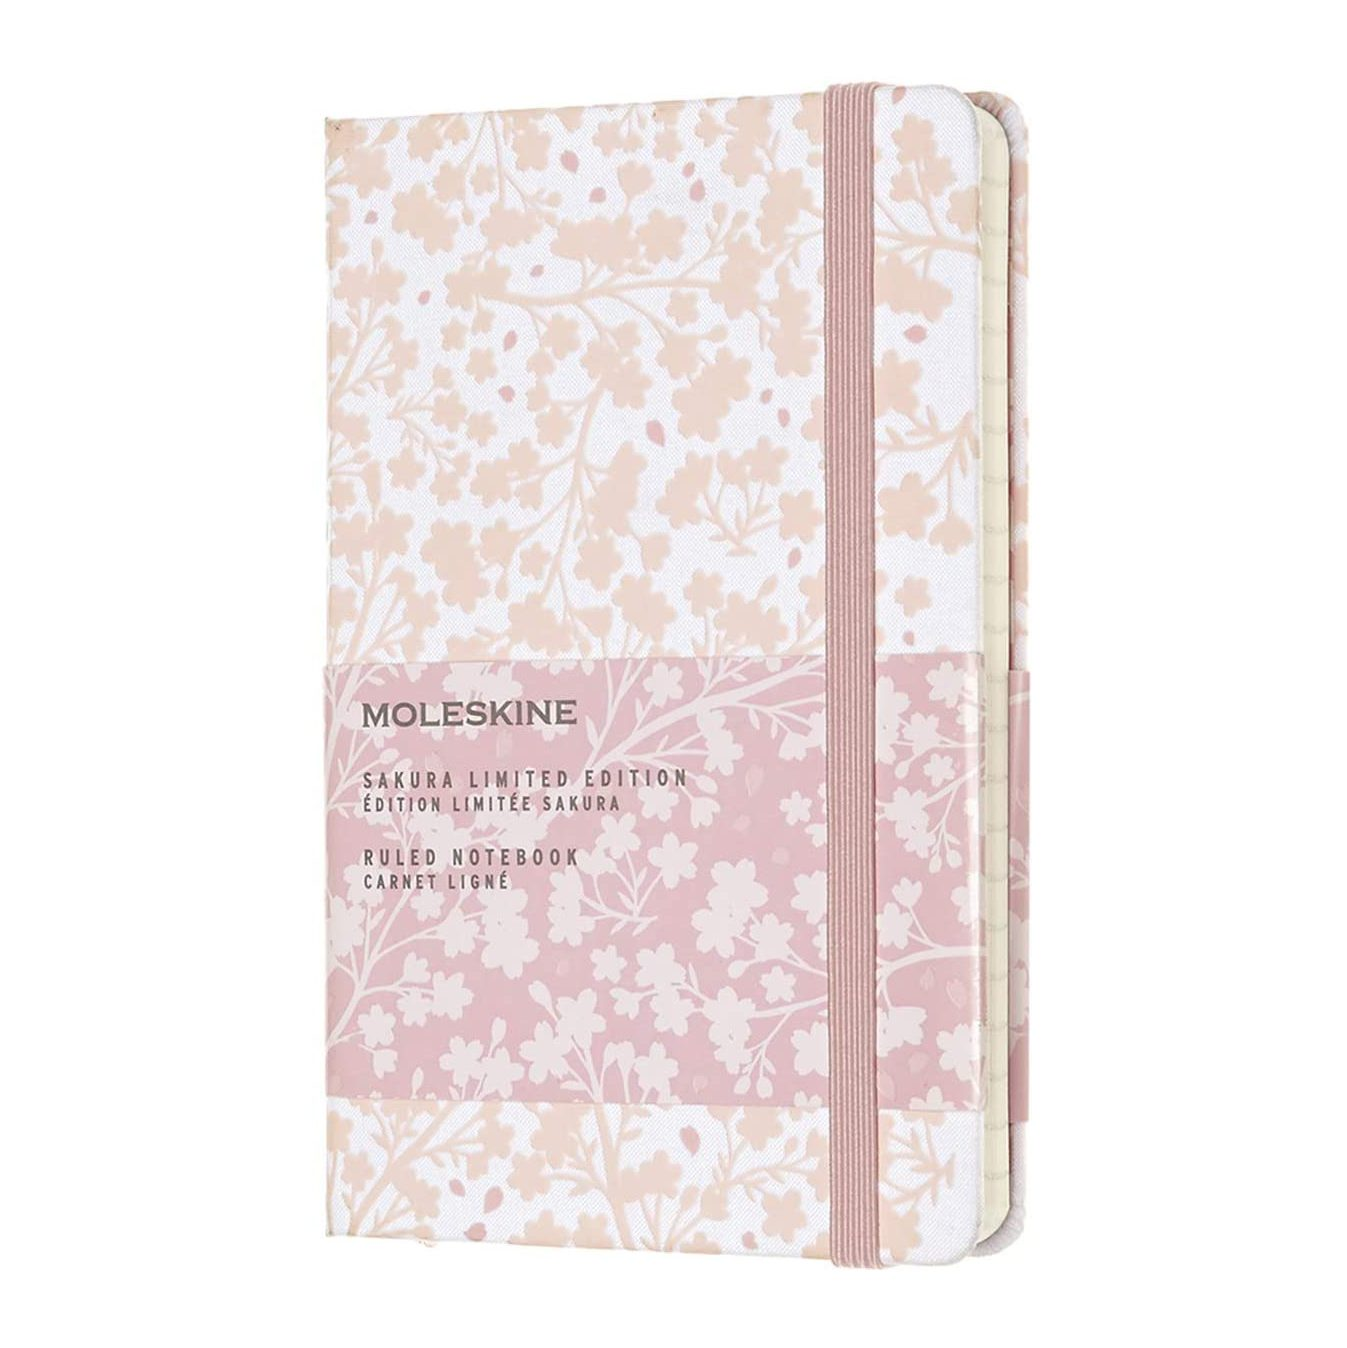 Limited Edition Sakura Notebook from Moleskine